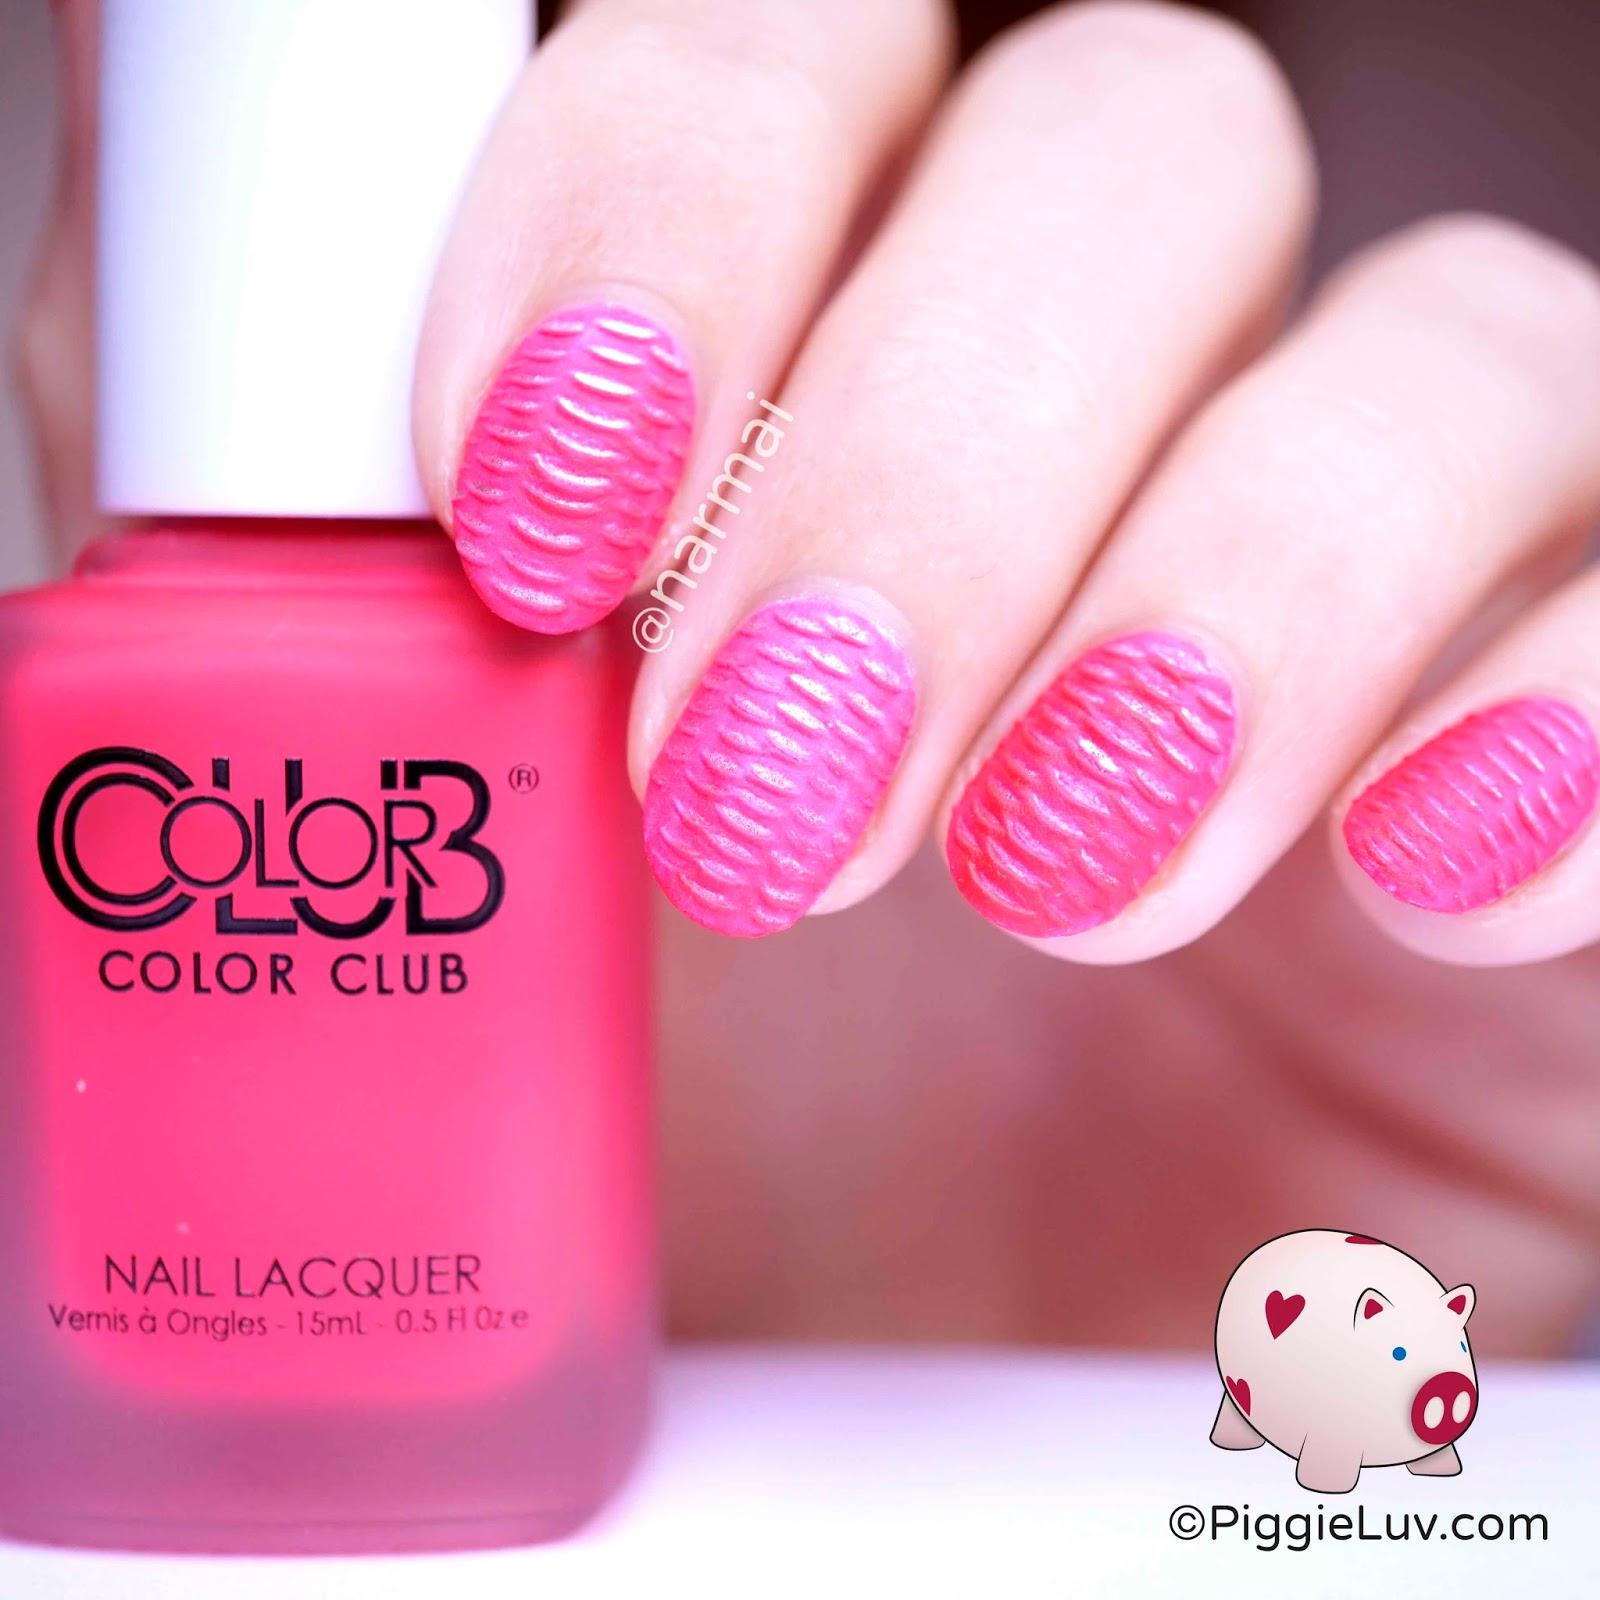 Piggieluv nail art using silicone brushes nail art using silicone brushes prinsesfo Choice Image